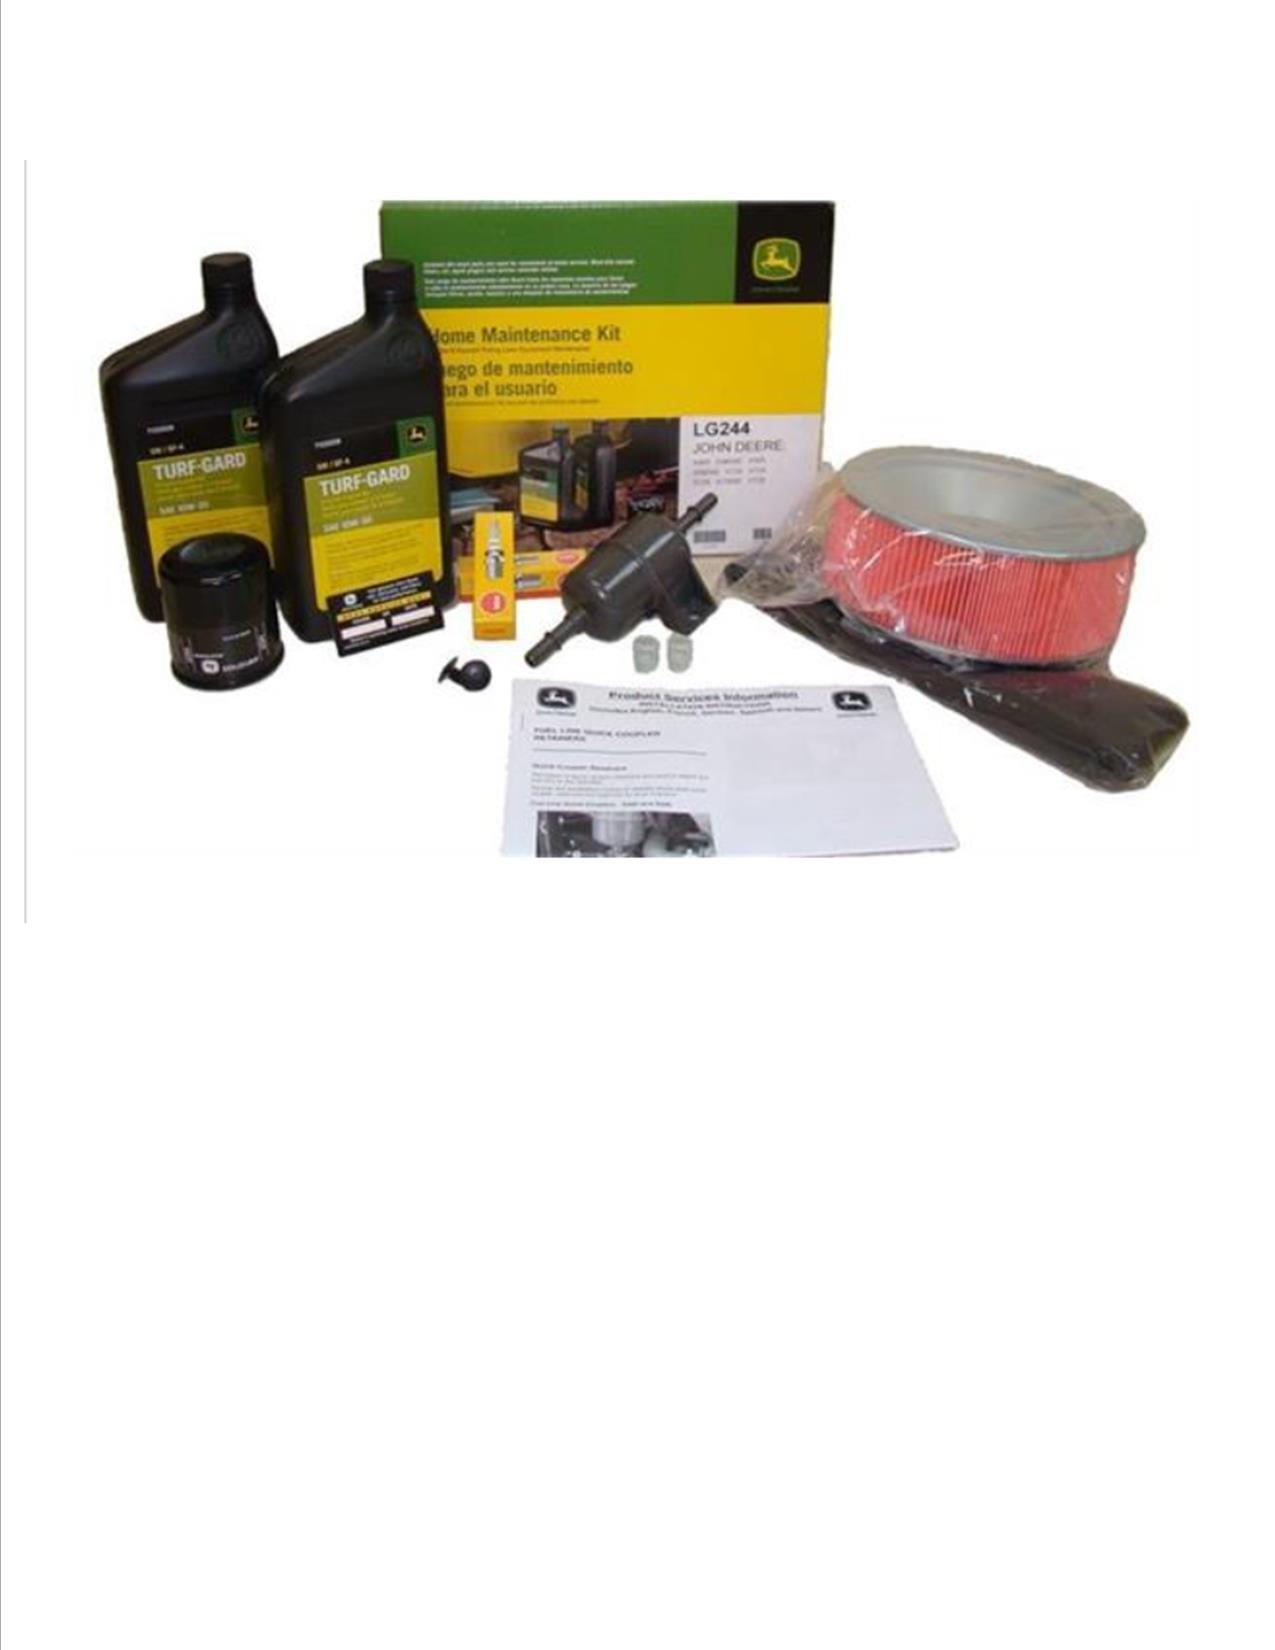 John Deere Maintenance Kit for X485, X485SE, X585, X585SE, X720, X724, X728, X728 SE Lawn Mower Filters, Oil LG244